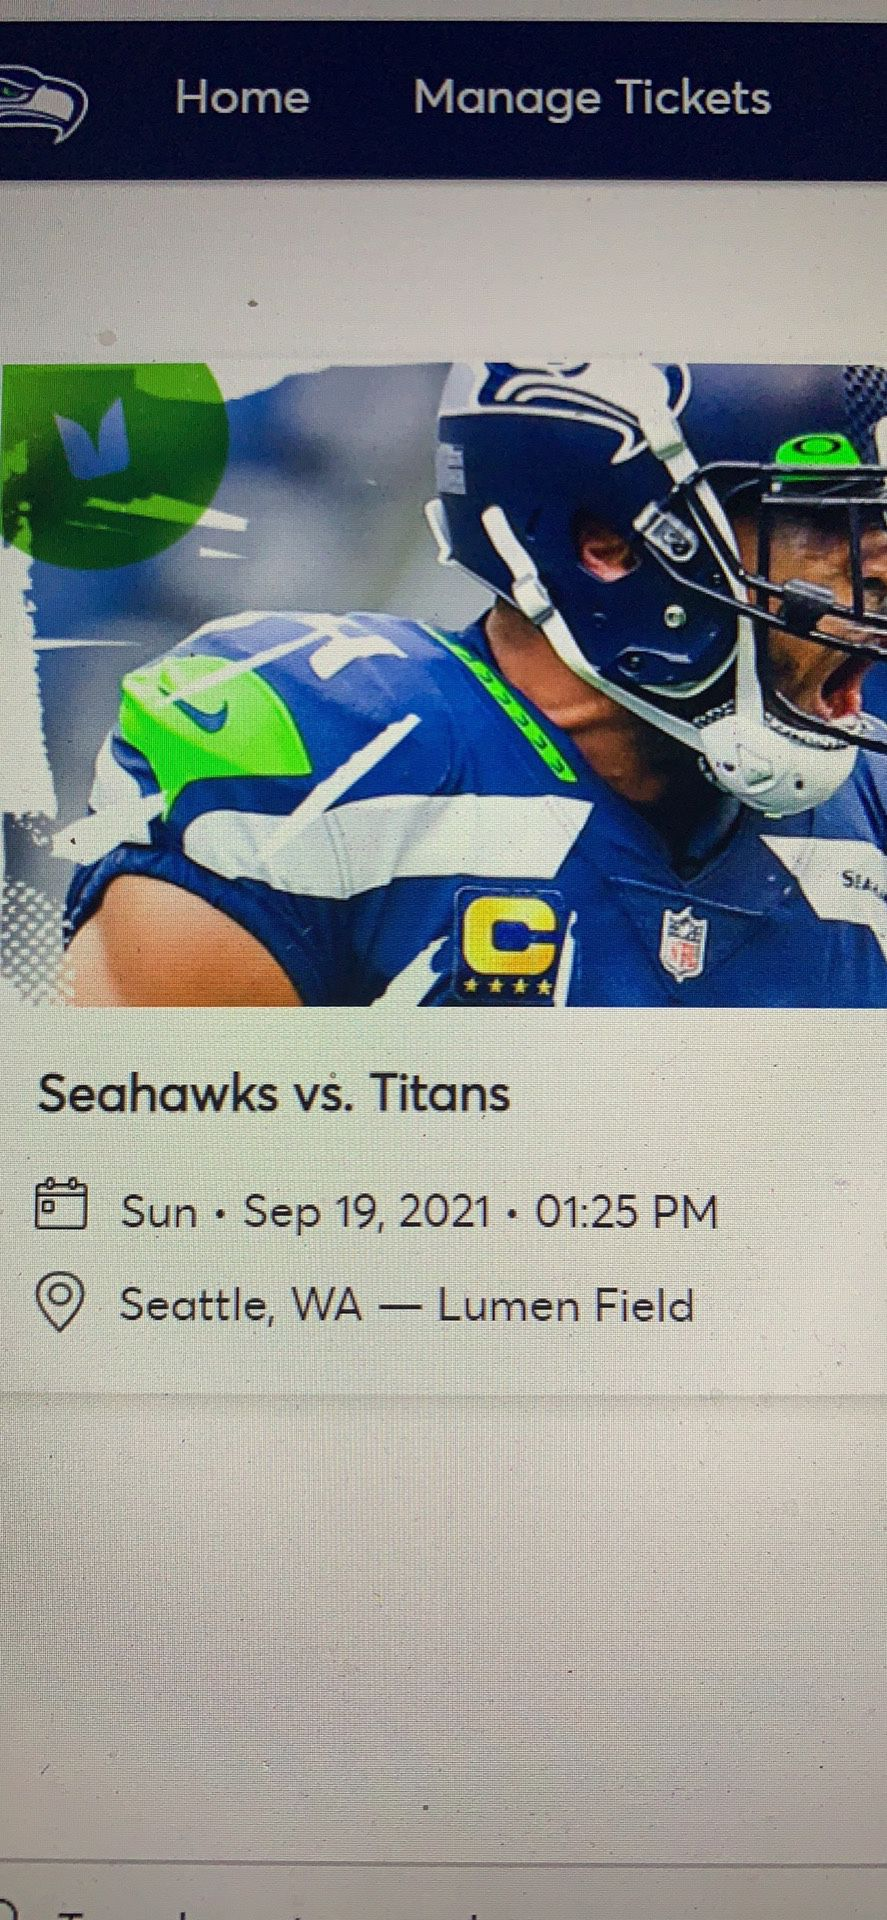 Two great aisle Club Seats - Seahawks vs. Titans - face value